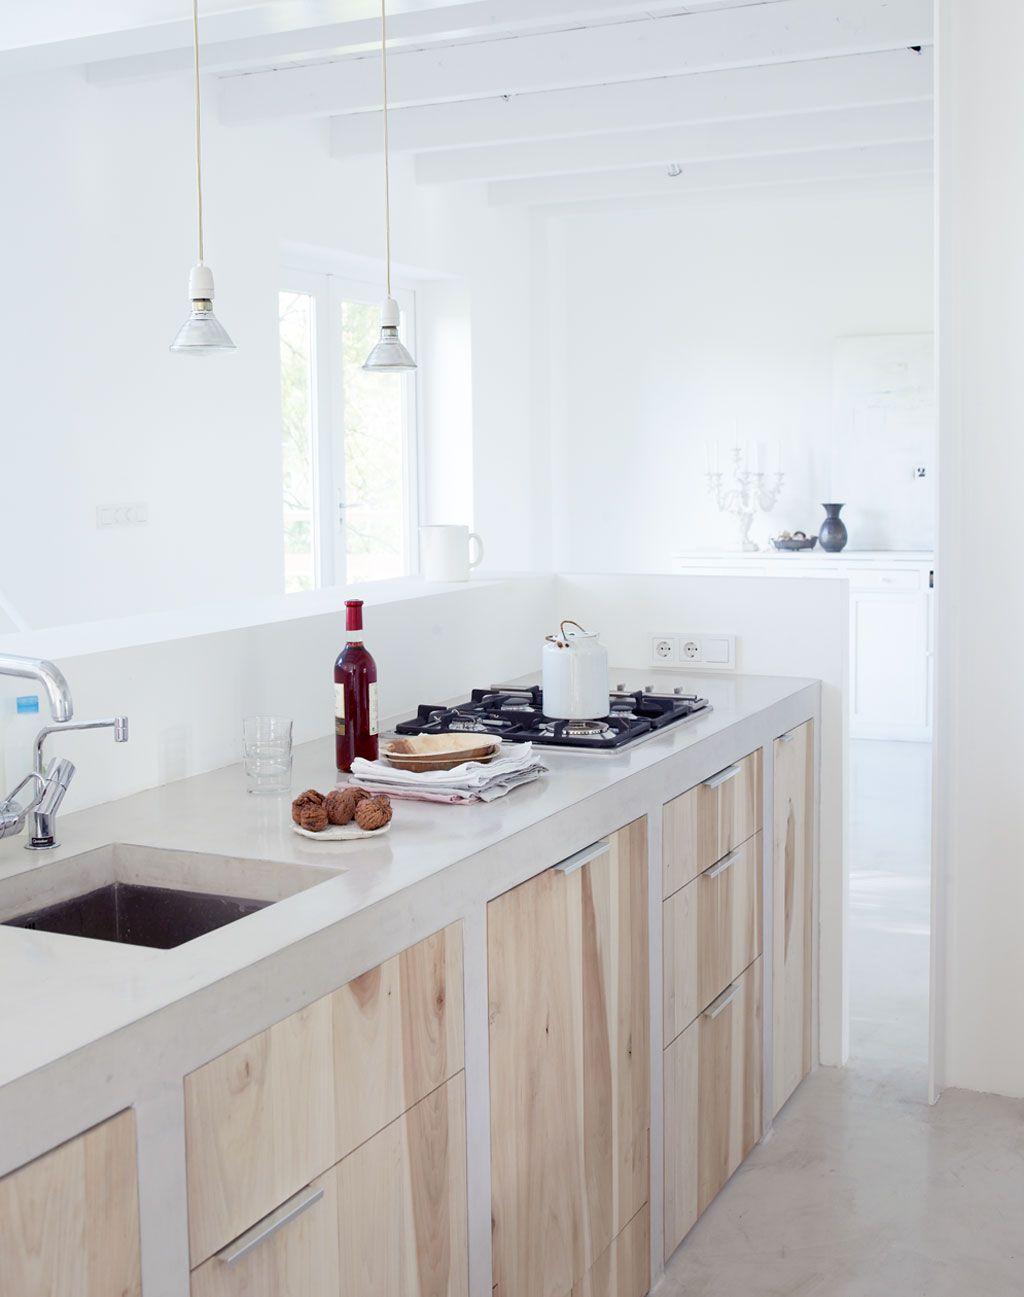 Keuken, beton met hout. | home | Pinterest | Betonküche, Beton ...